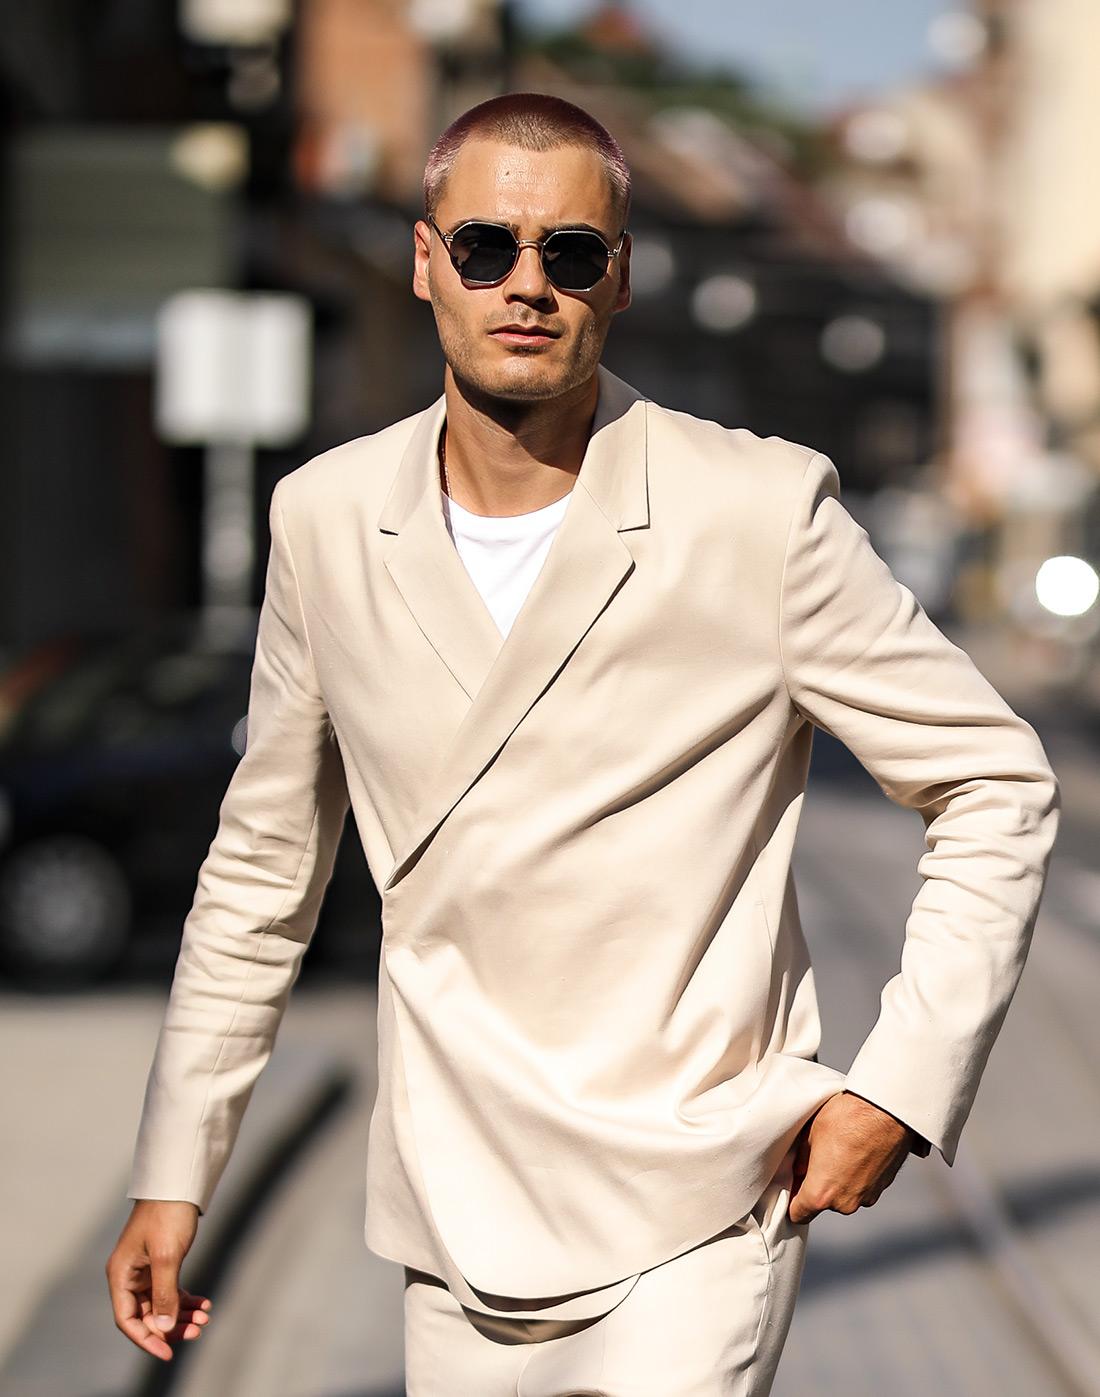 street style Marko Medić bloger Father of Djordje style zagreb muška ulična moda ljeto 2020